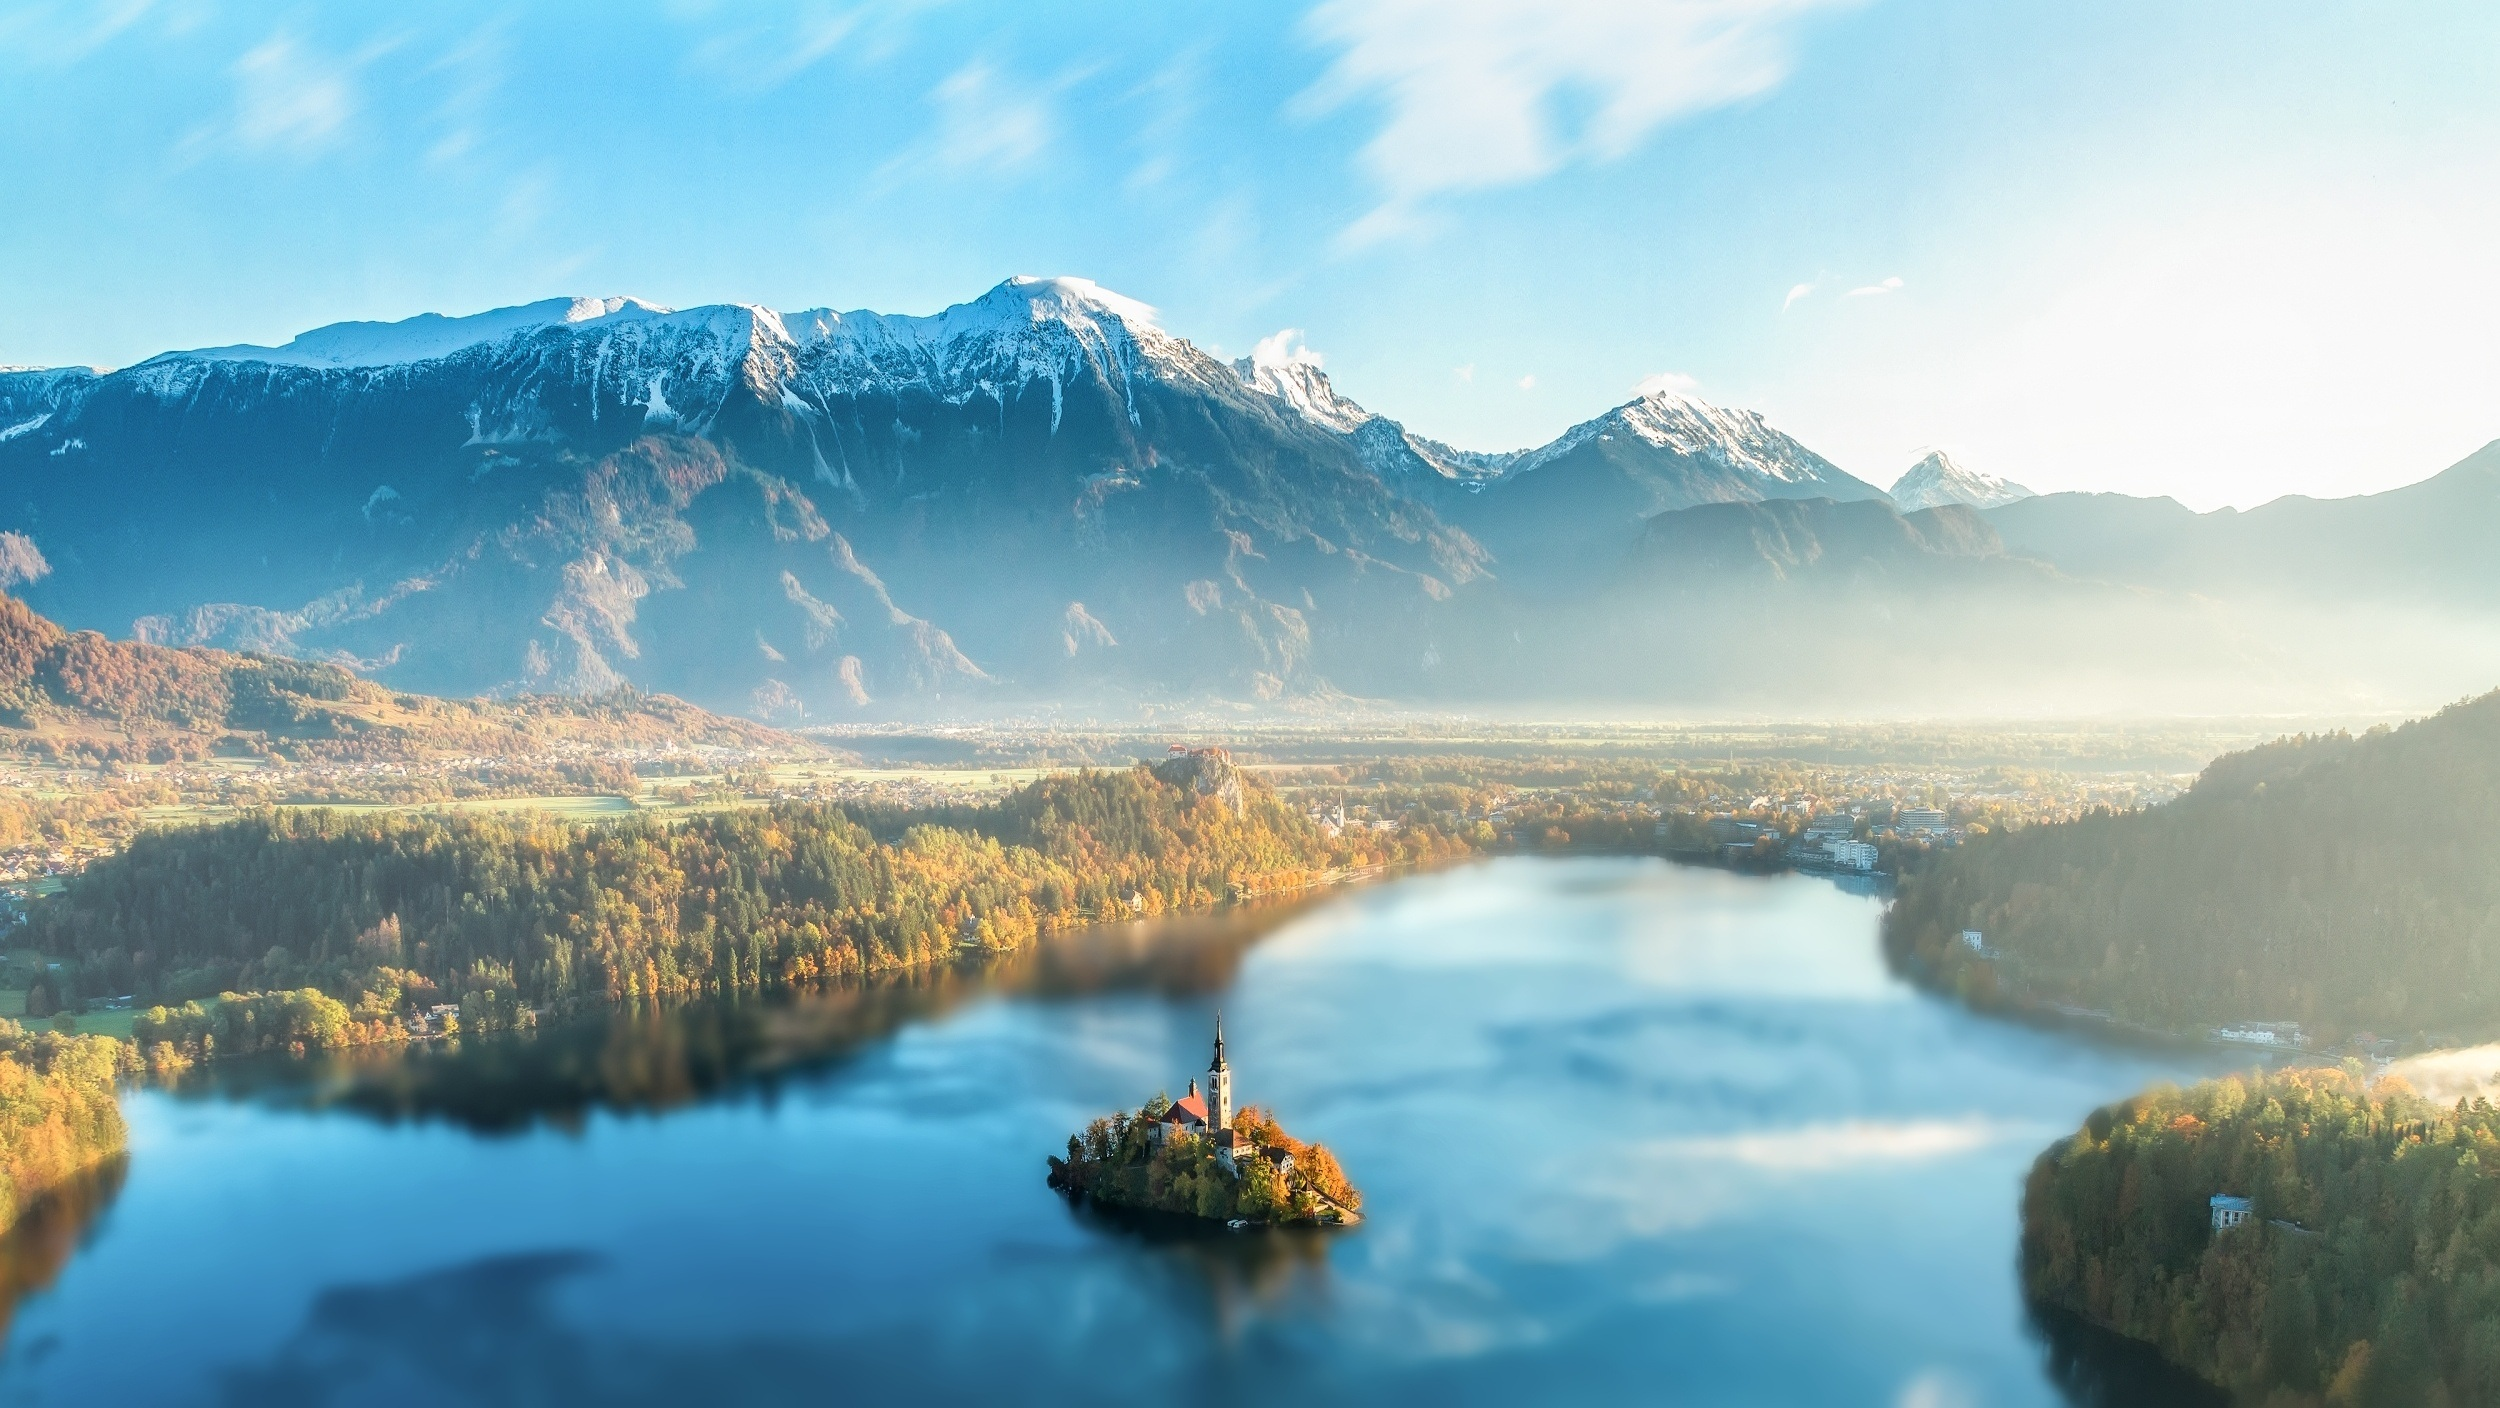 Slovenia Regional Discovery - Lake Bled, Slovenia